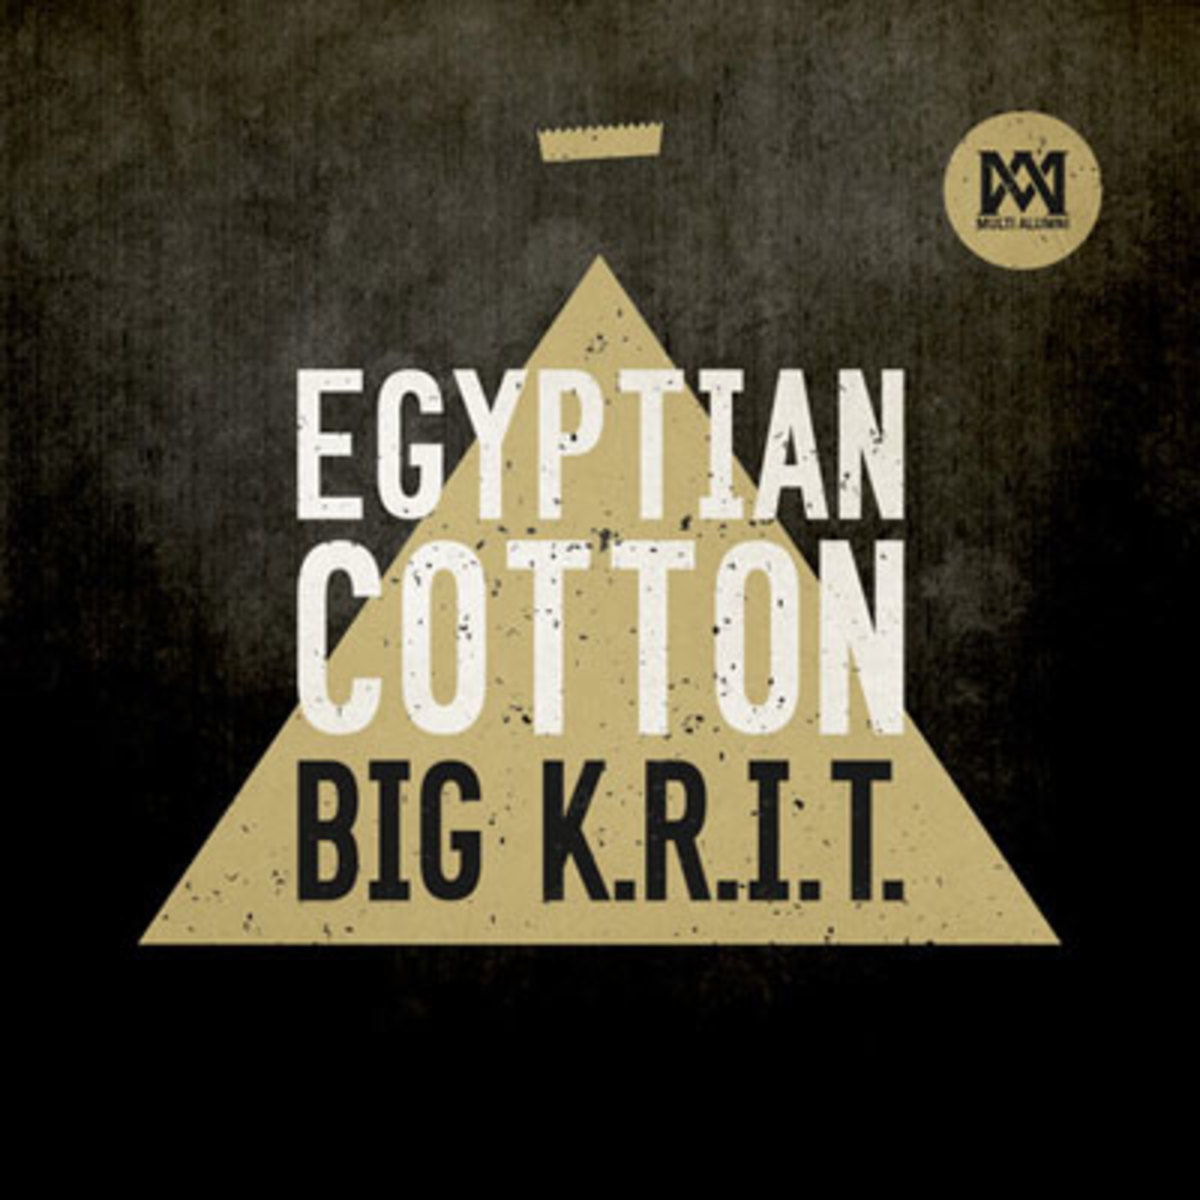 bigkrit-egyptiancotton.jpg